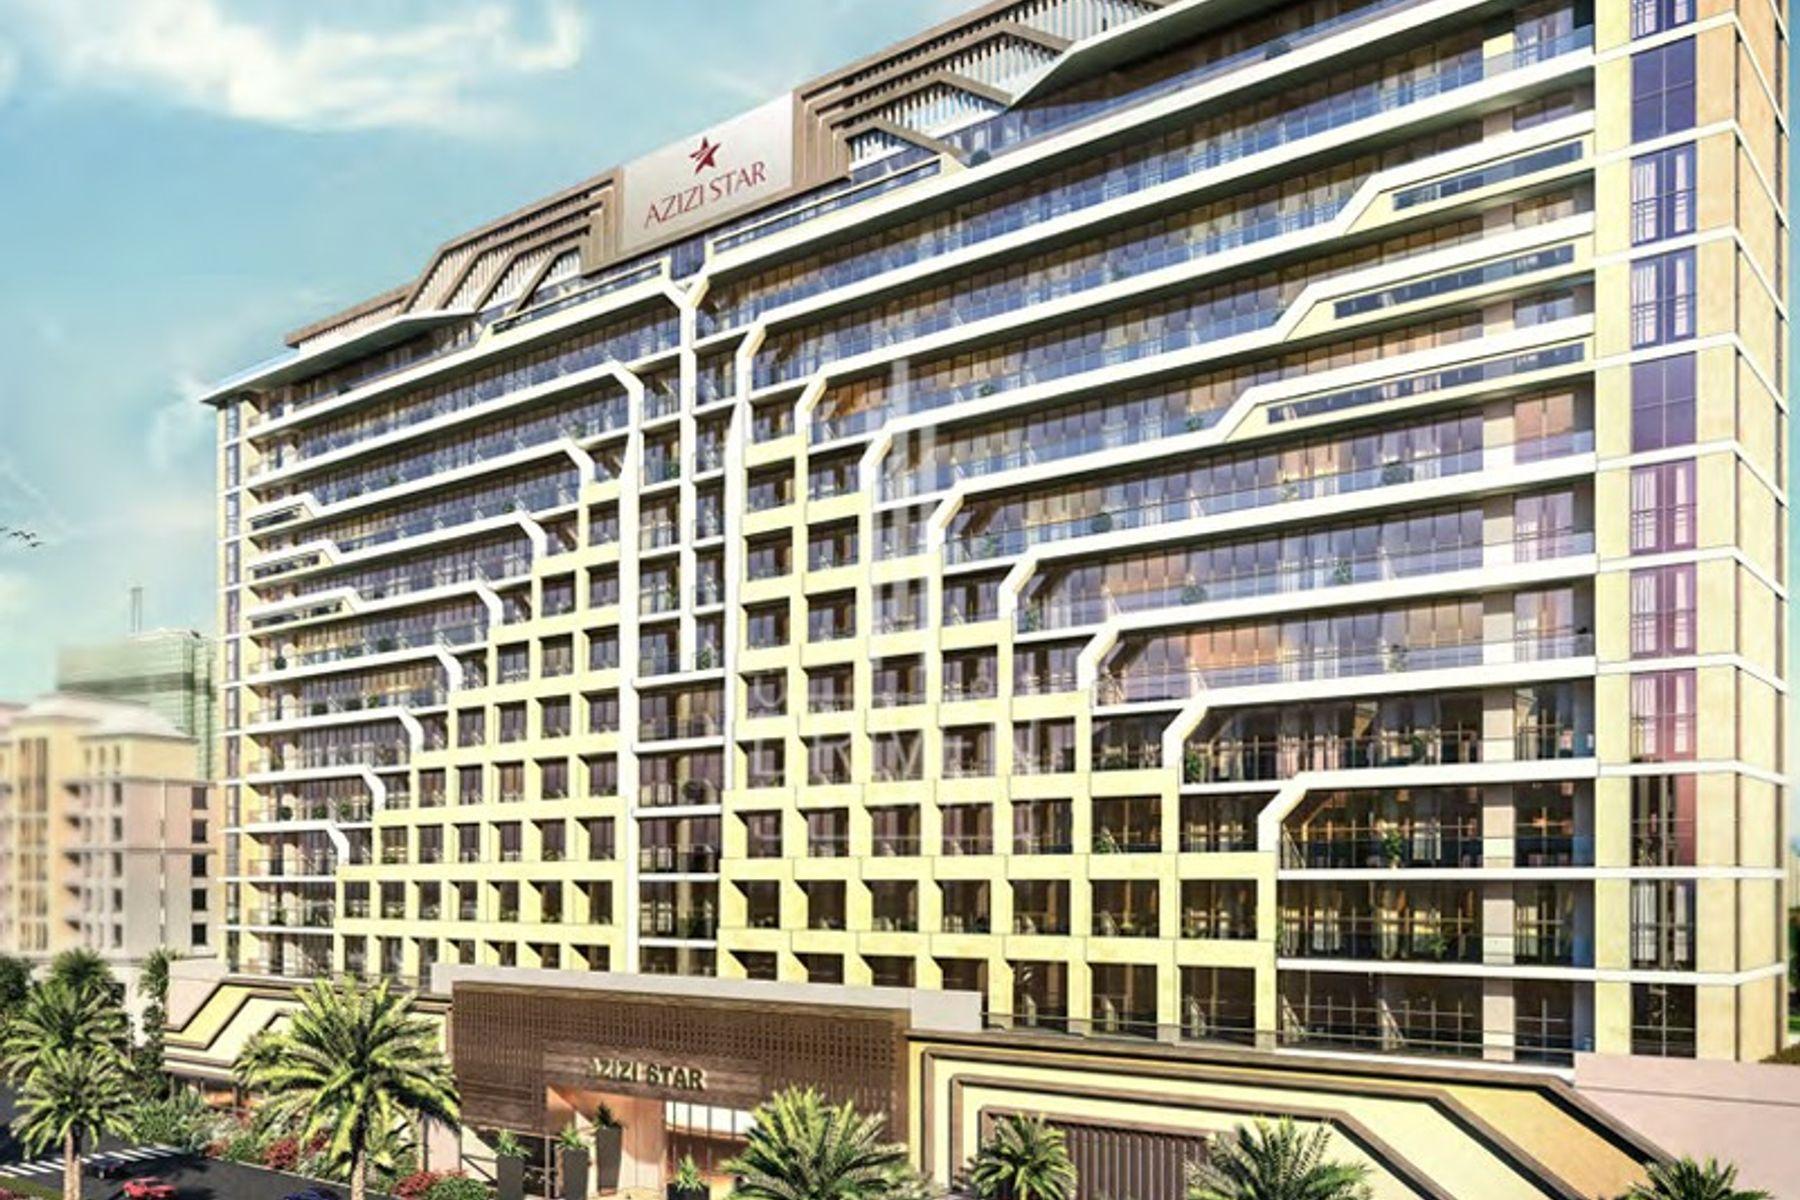 Apartment for Sale in Azizi Star, Al Furjan